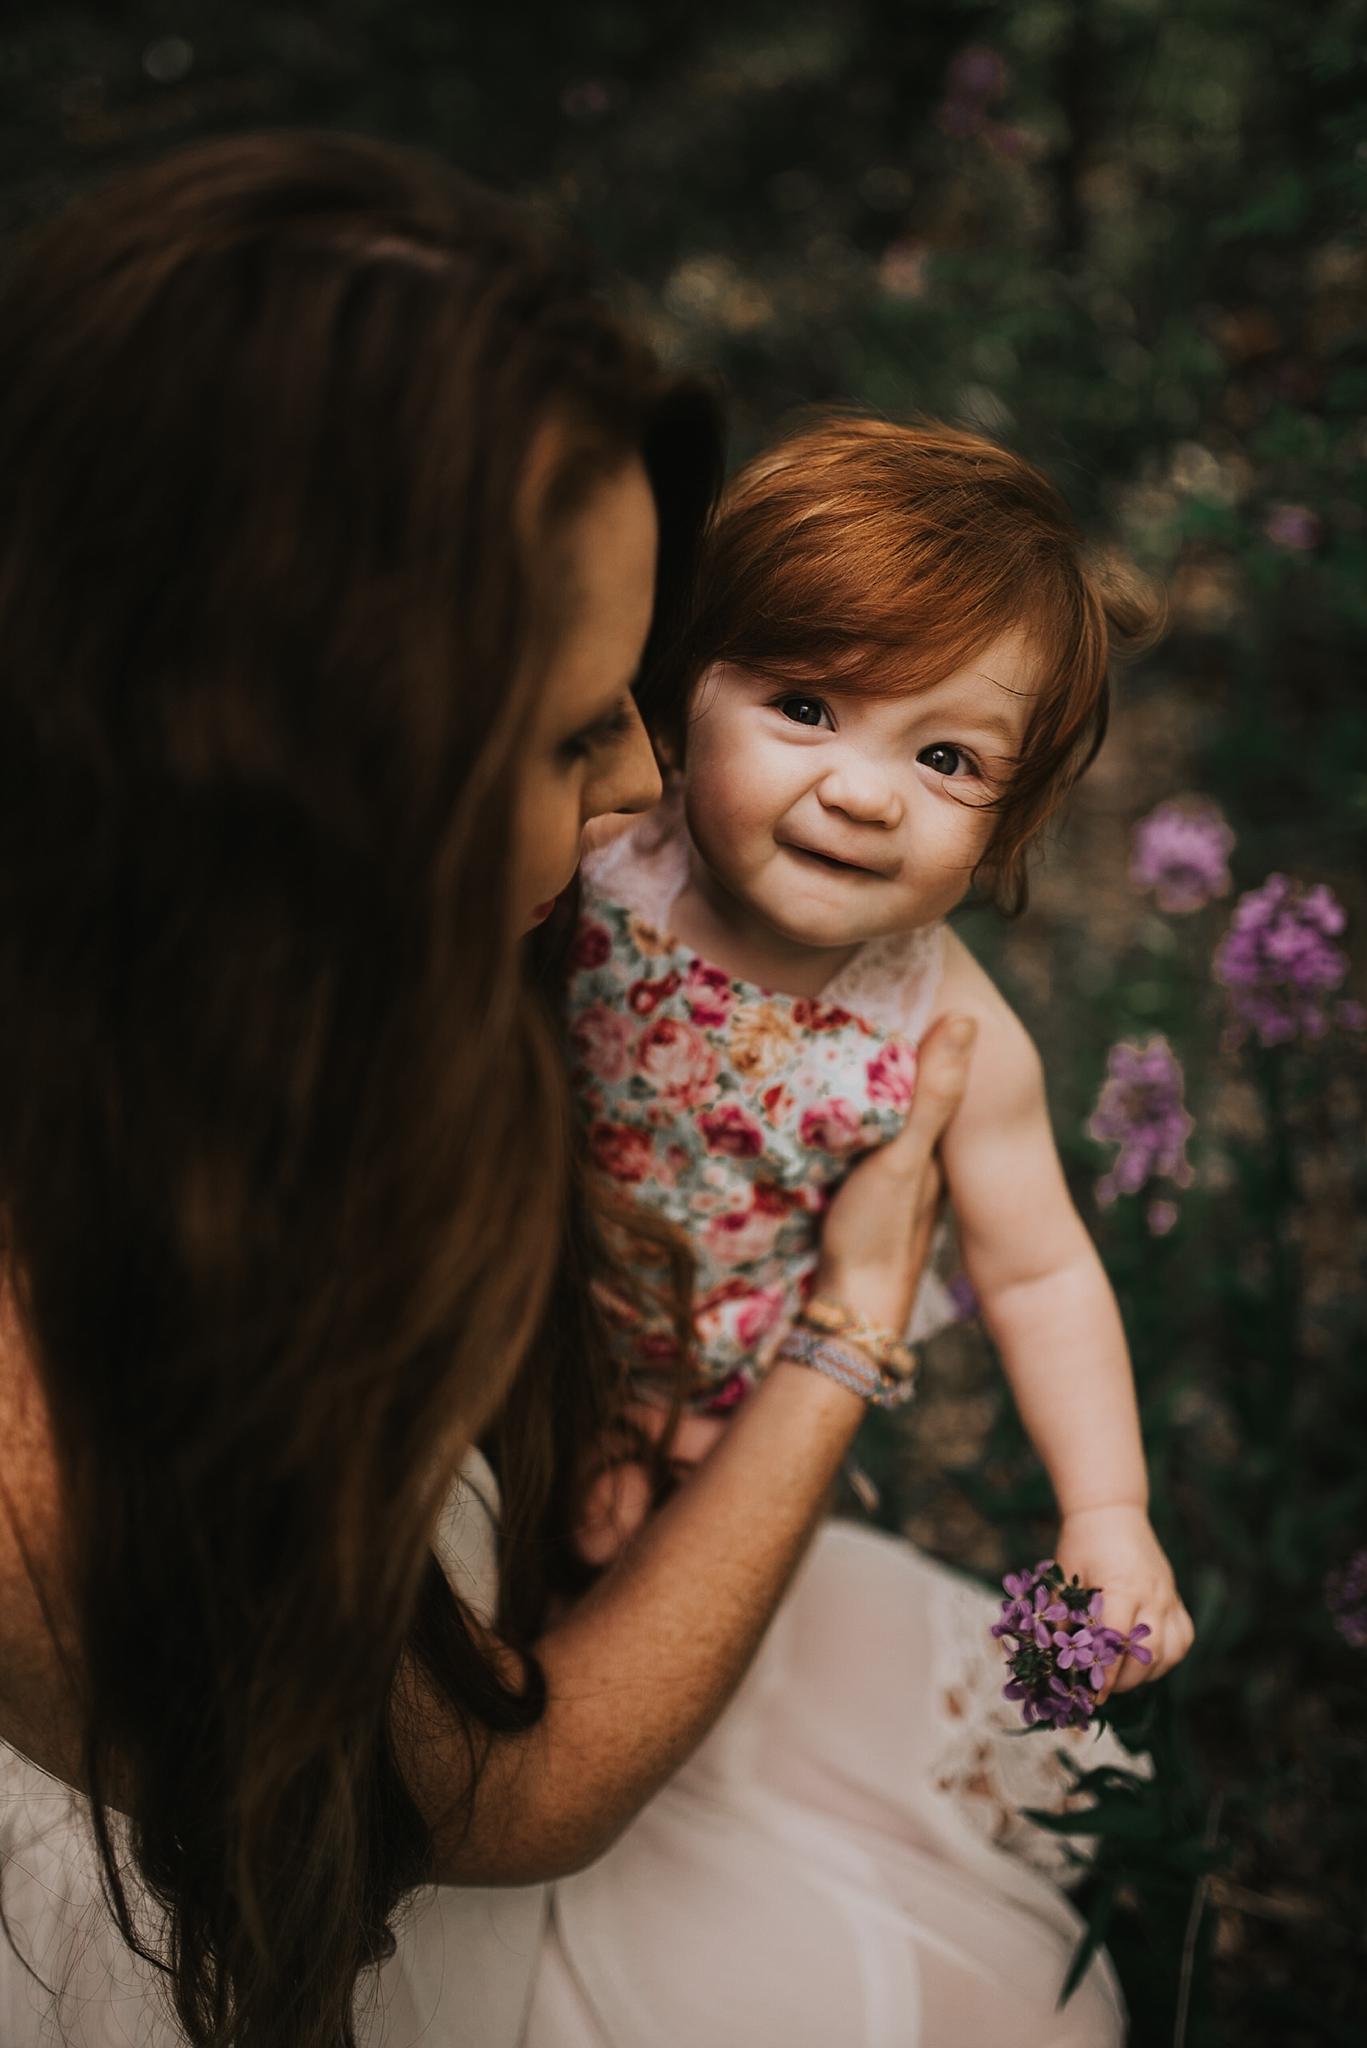 twyla jones photography - mother daughter - field and forest-4227_treasure coast florida-1.jpg